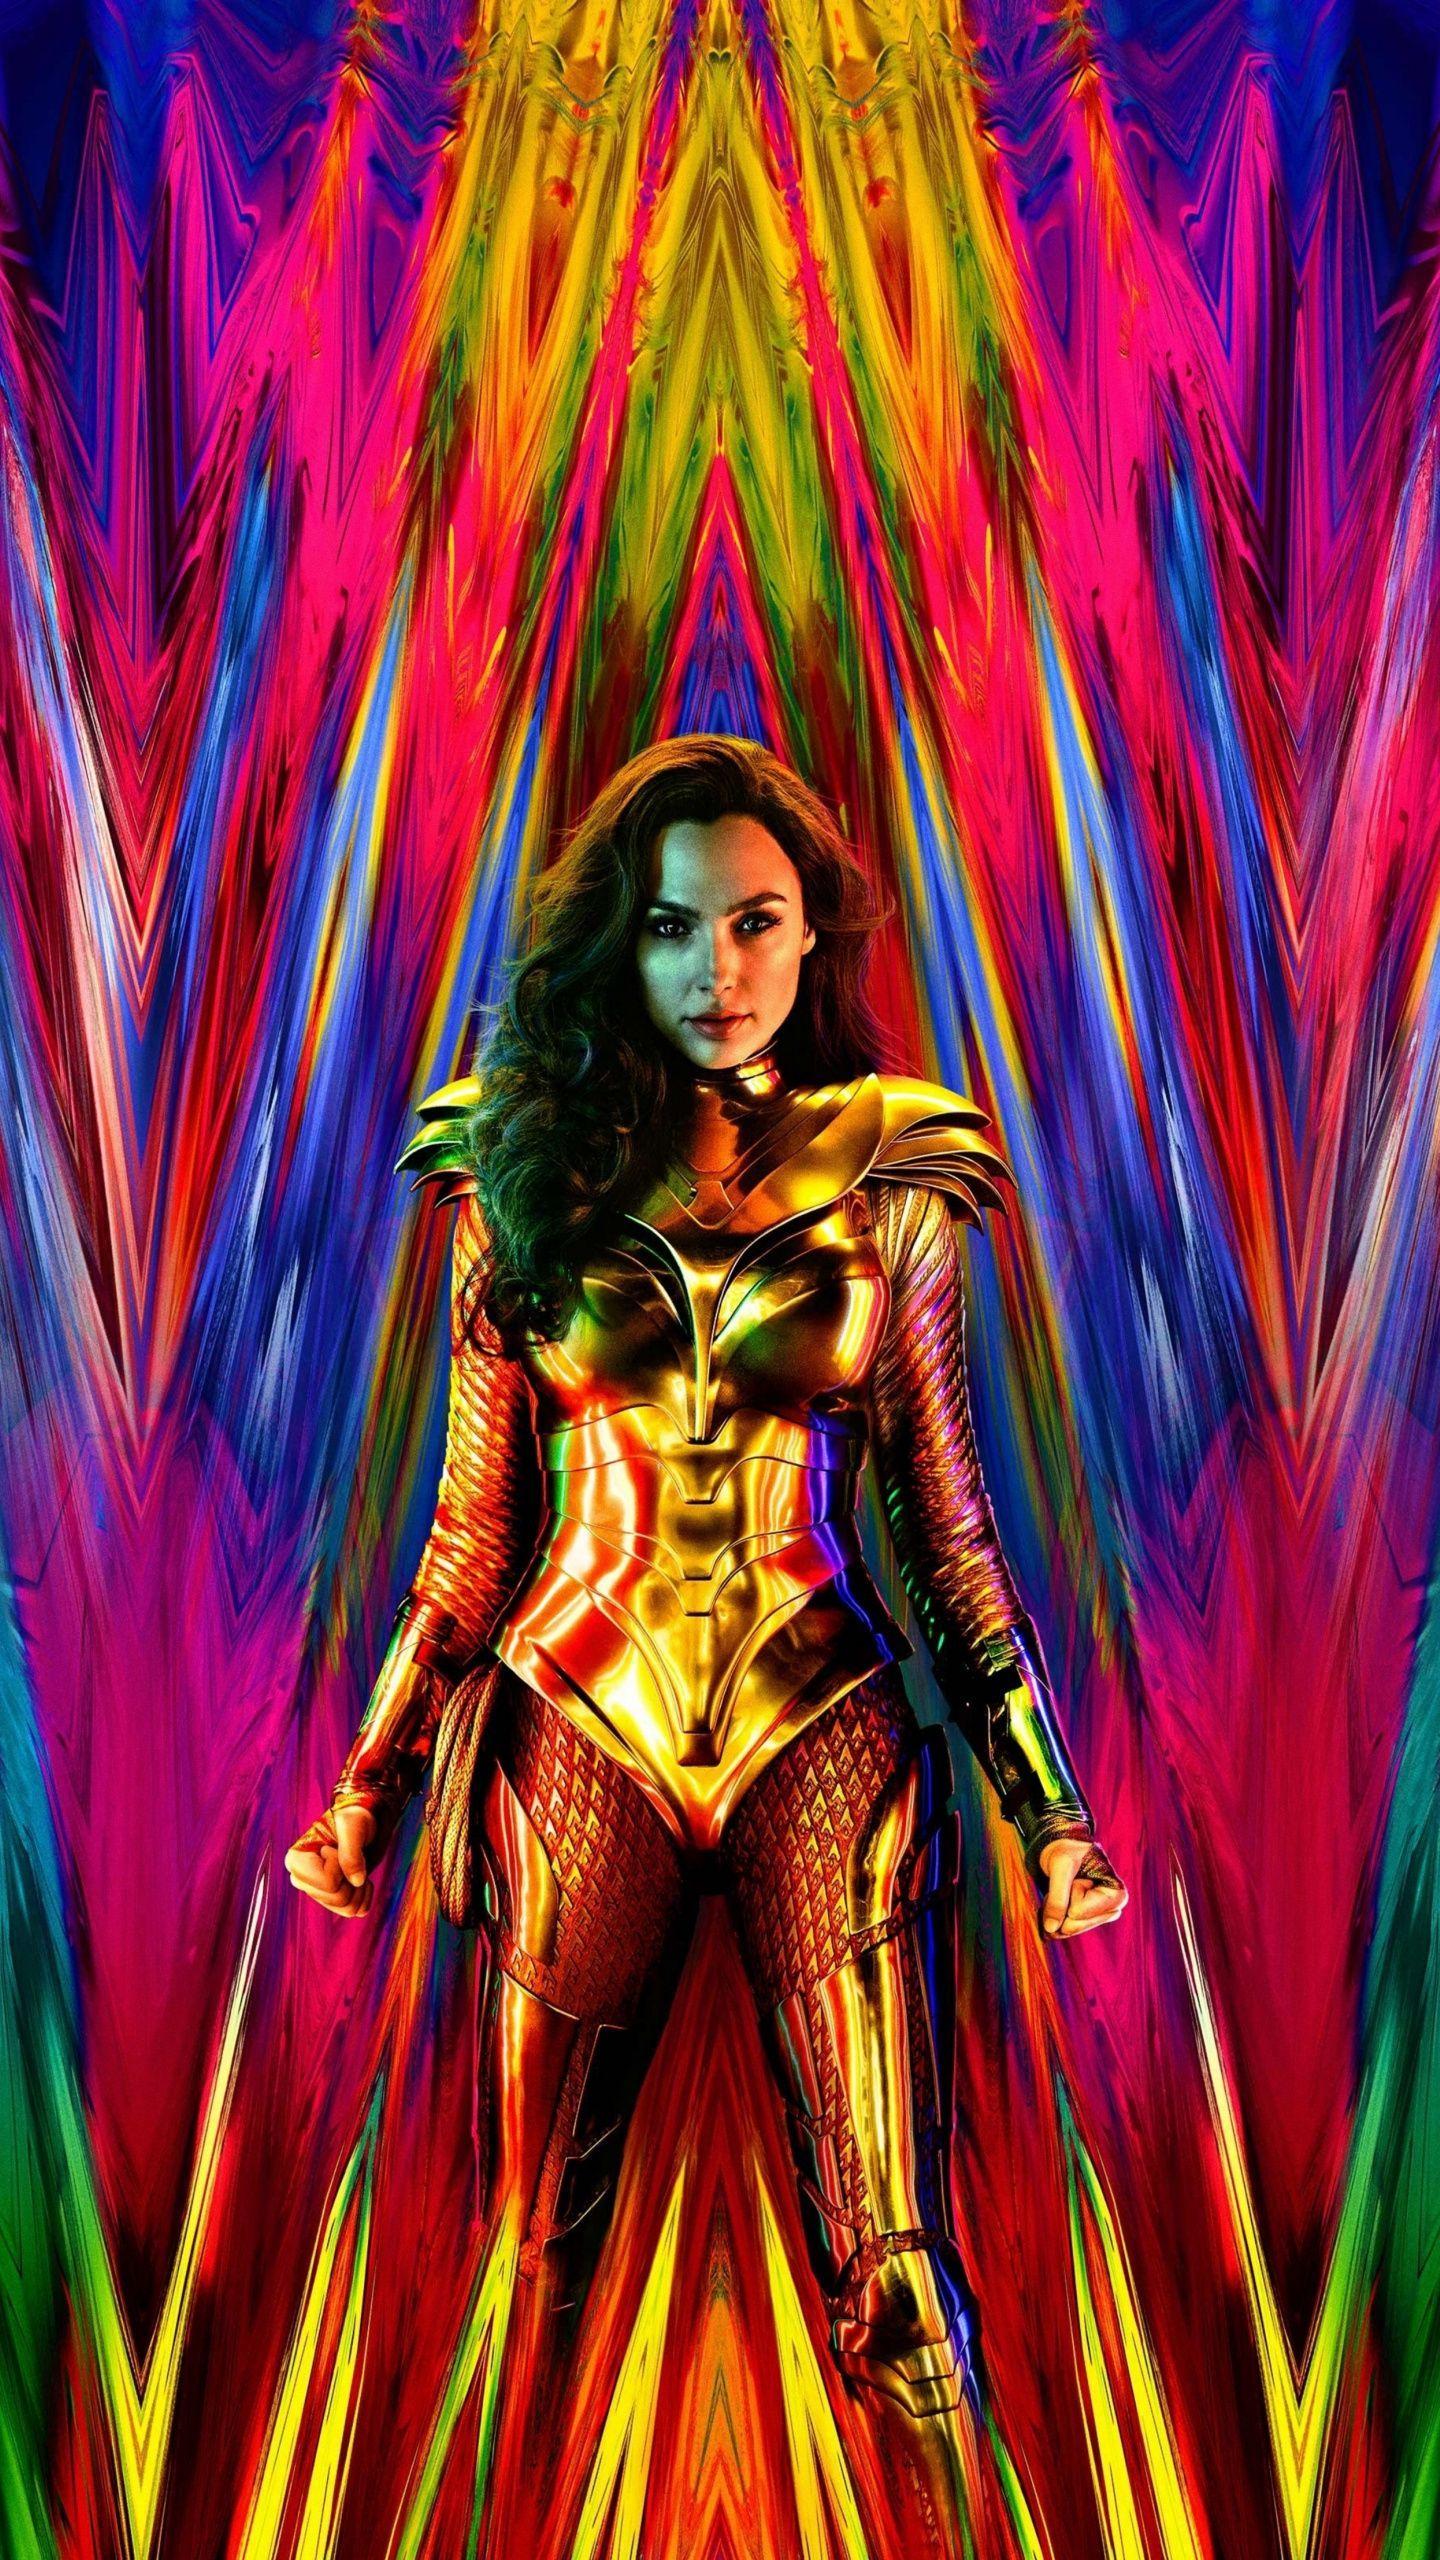 1440x2560 Wonder Woman 1984 Gal Gadot 2020 Wallpaper In 2020 Gal Gadot Wonder Woman Wonder Woman Gal Gadot